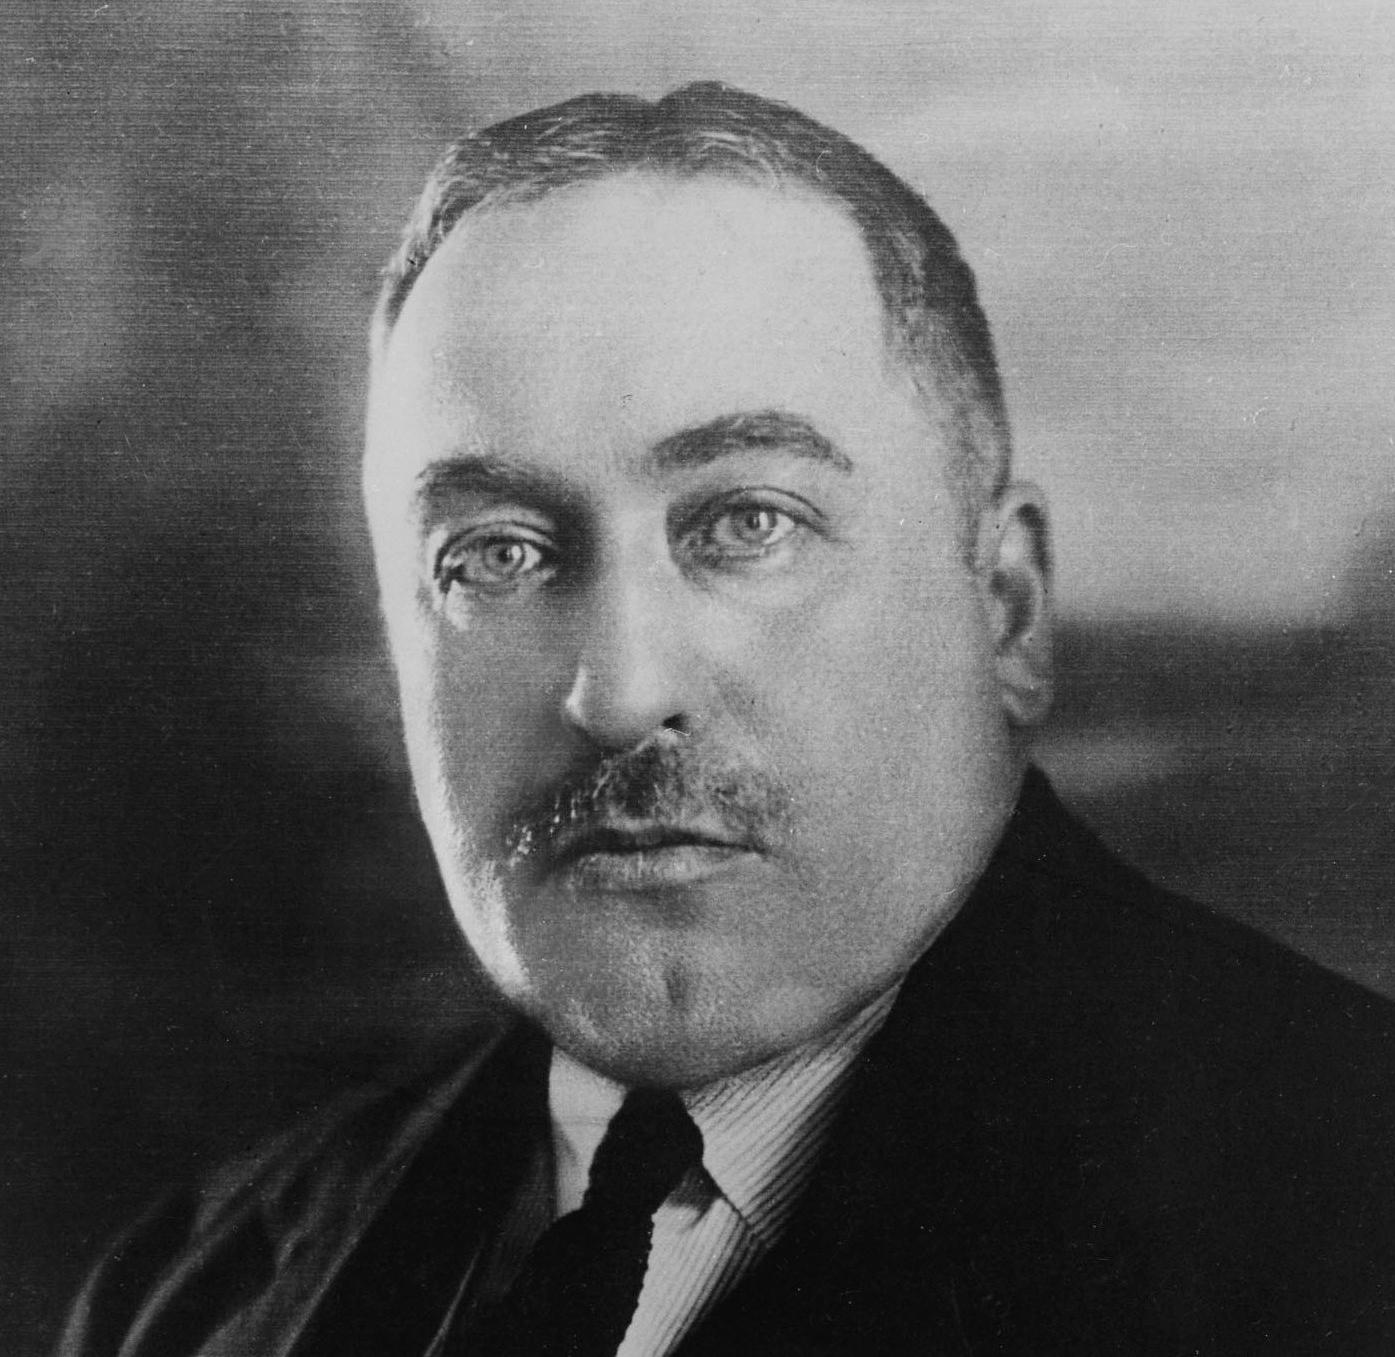 Horace Finaly Wikipedia